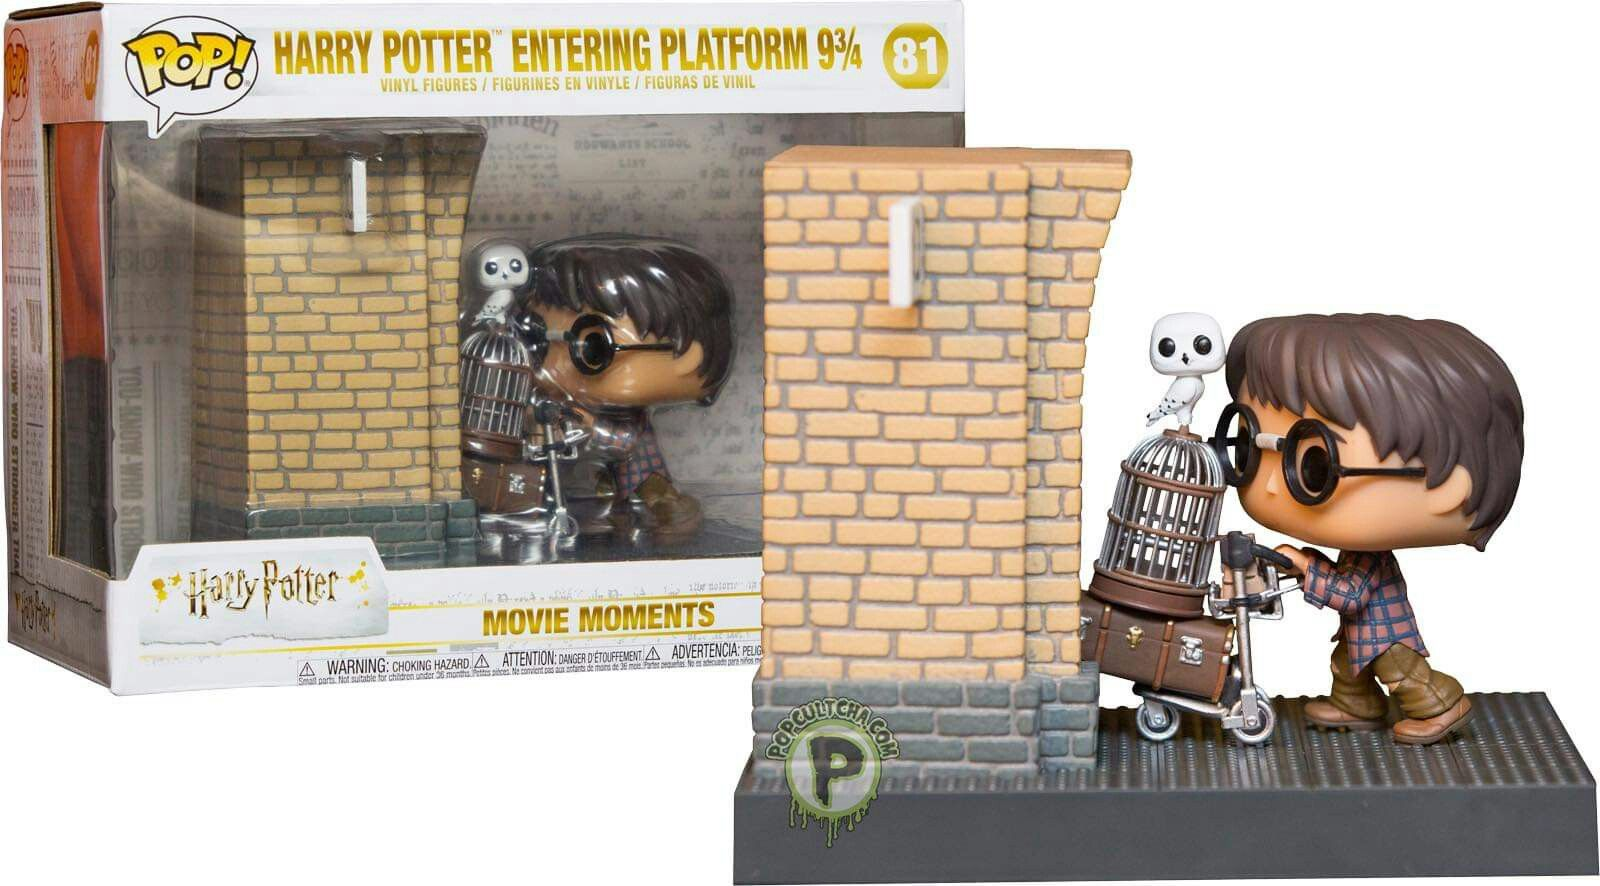 Pin by Ann Kautz on Wizarding World Harry potter funko